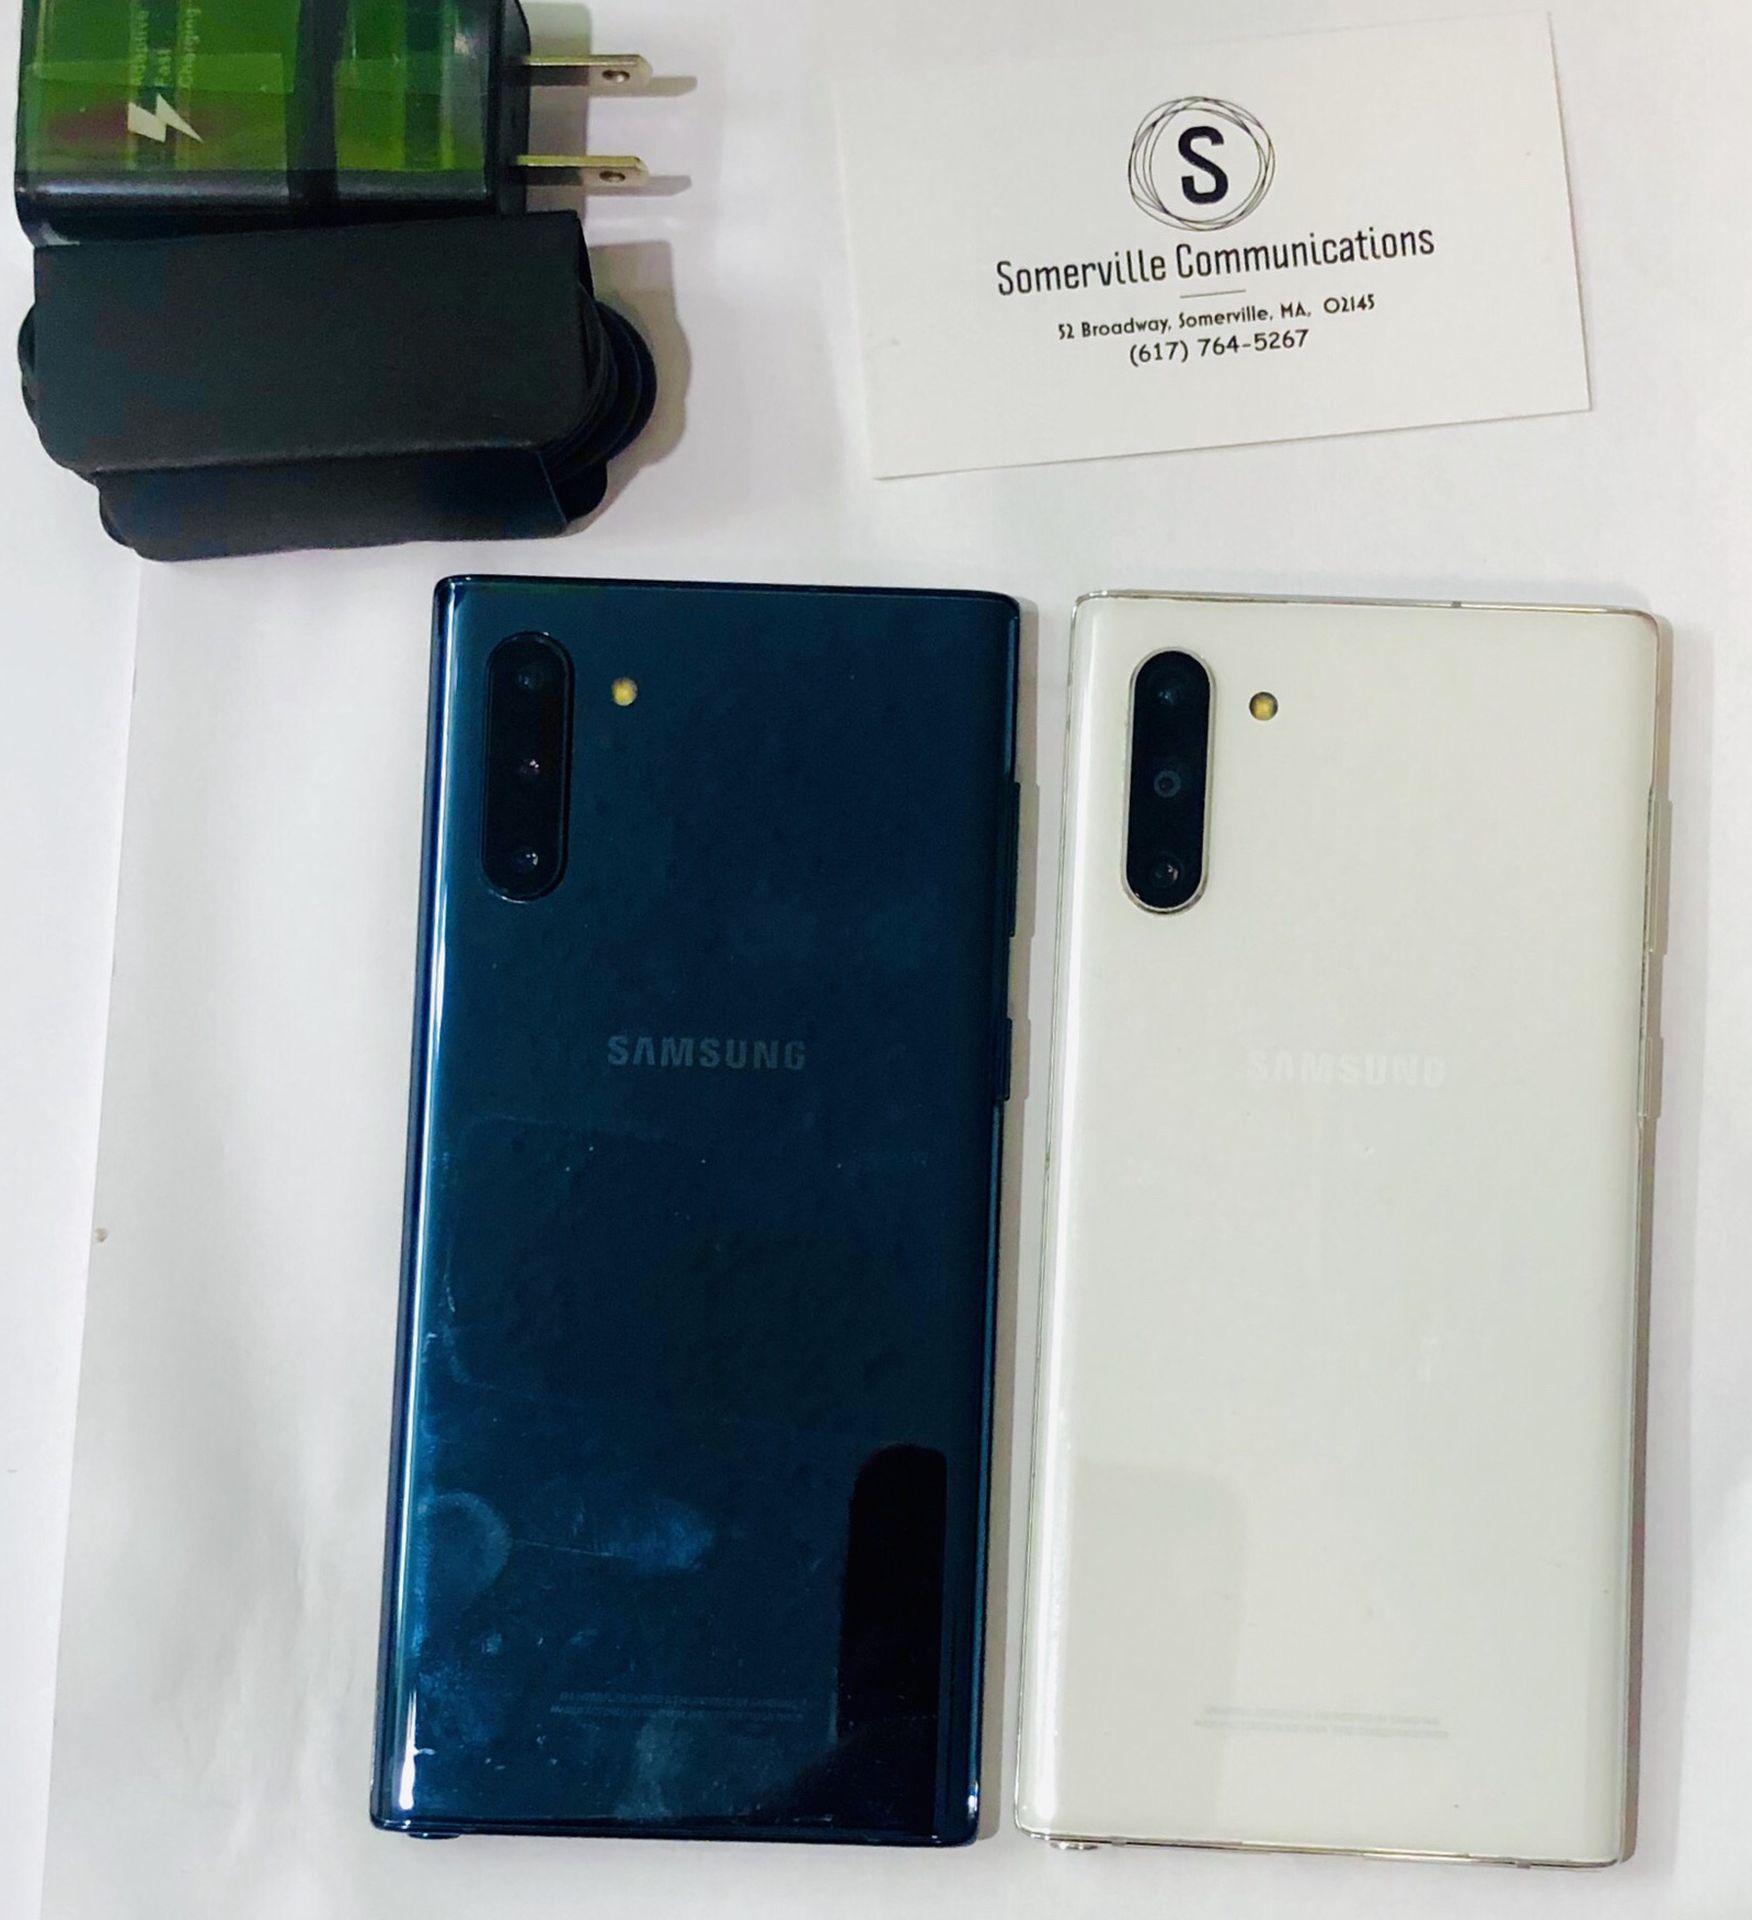 Samsung Galaxy Note 10 unlocked store warranty